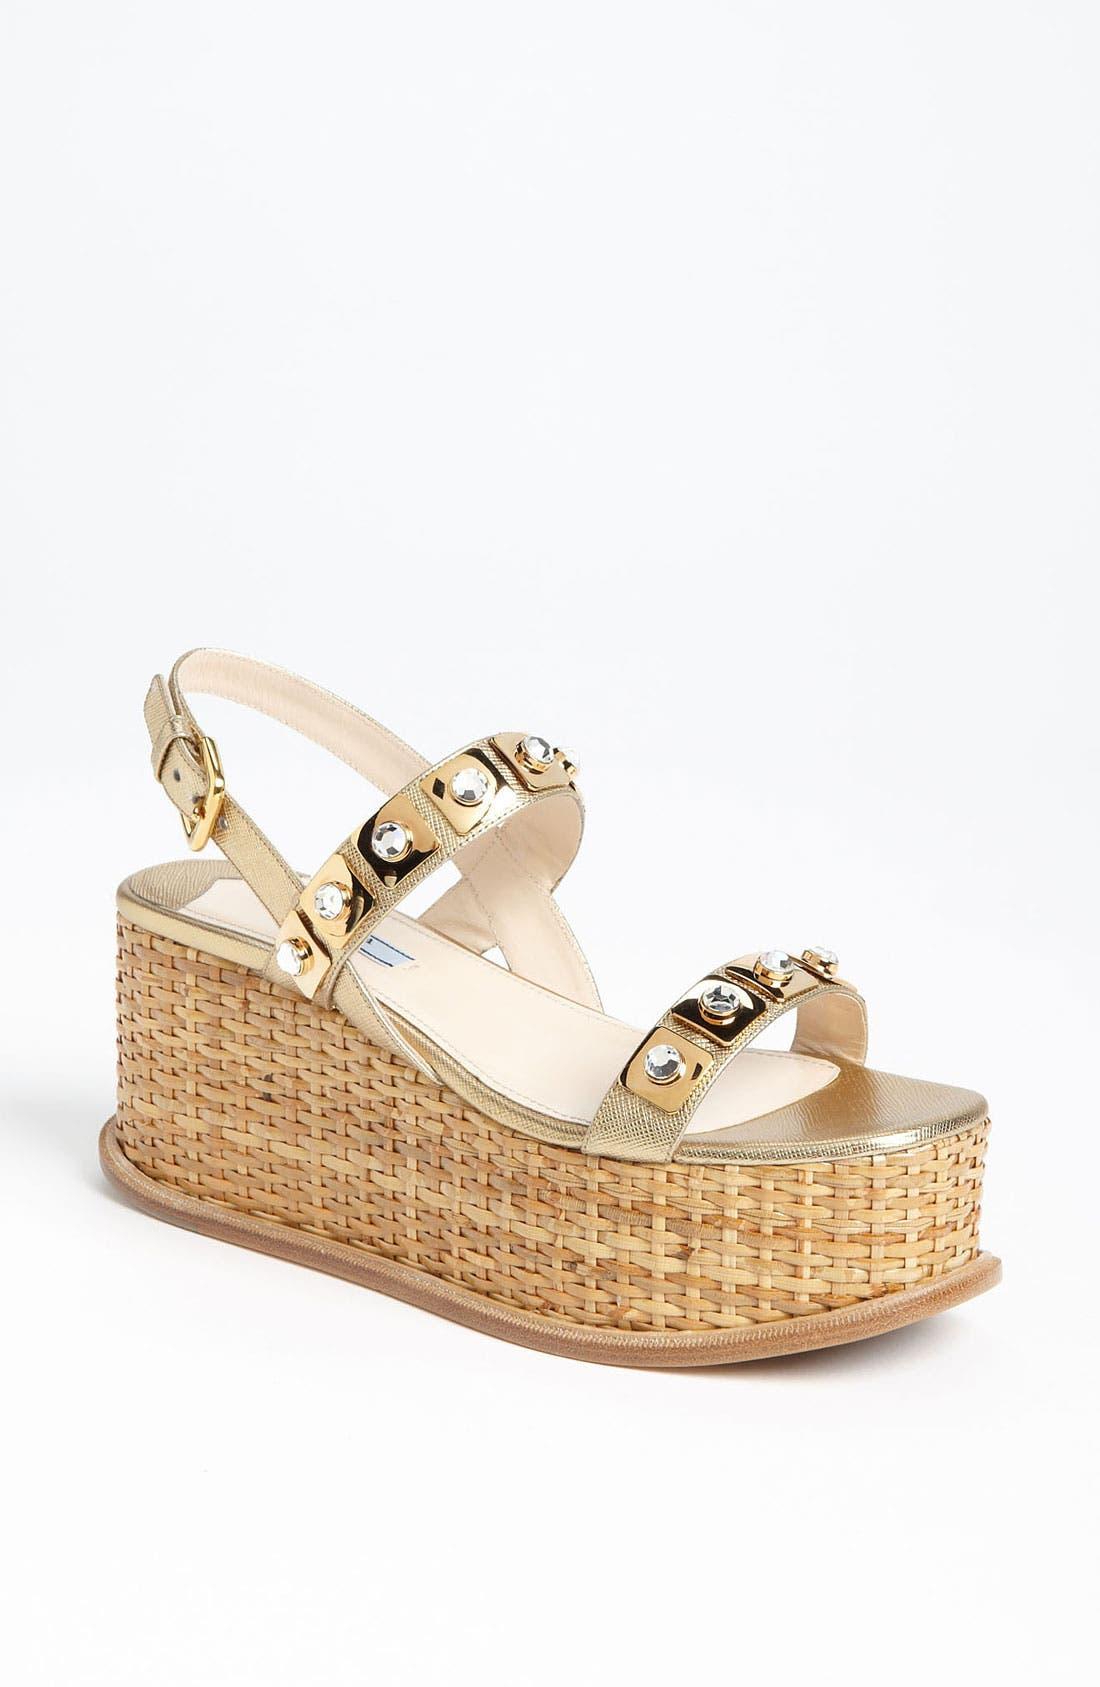 Alternate Image 1 Selected - Prada Two Strap Wedge Sandal